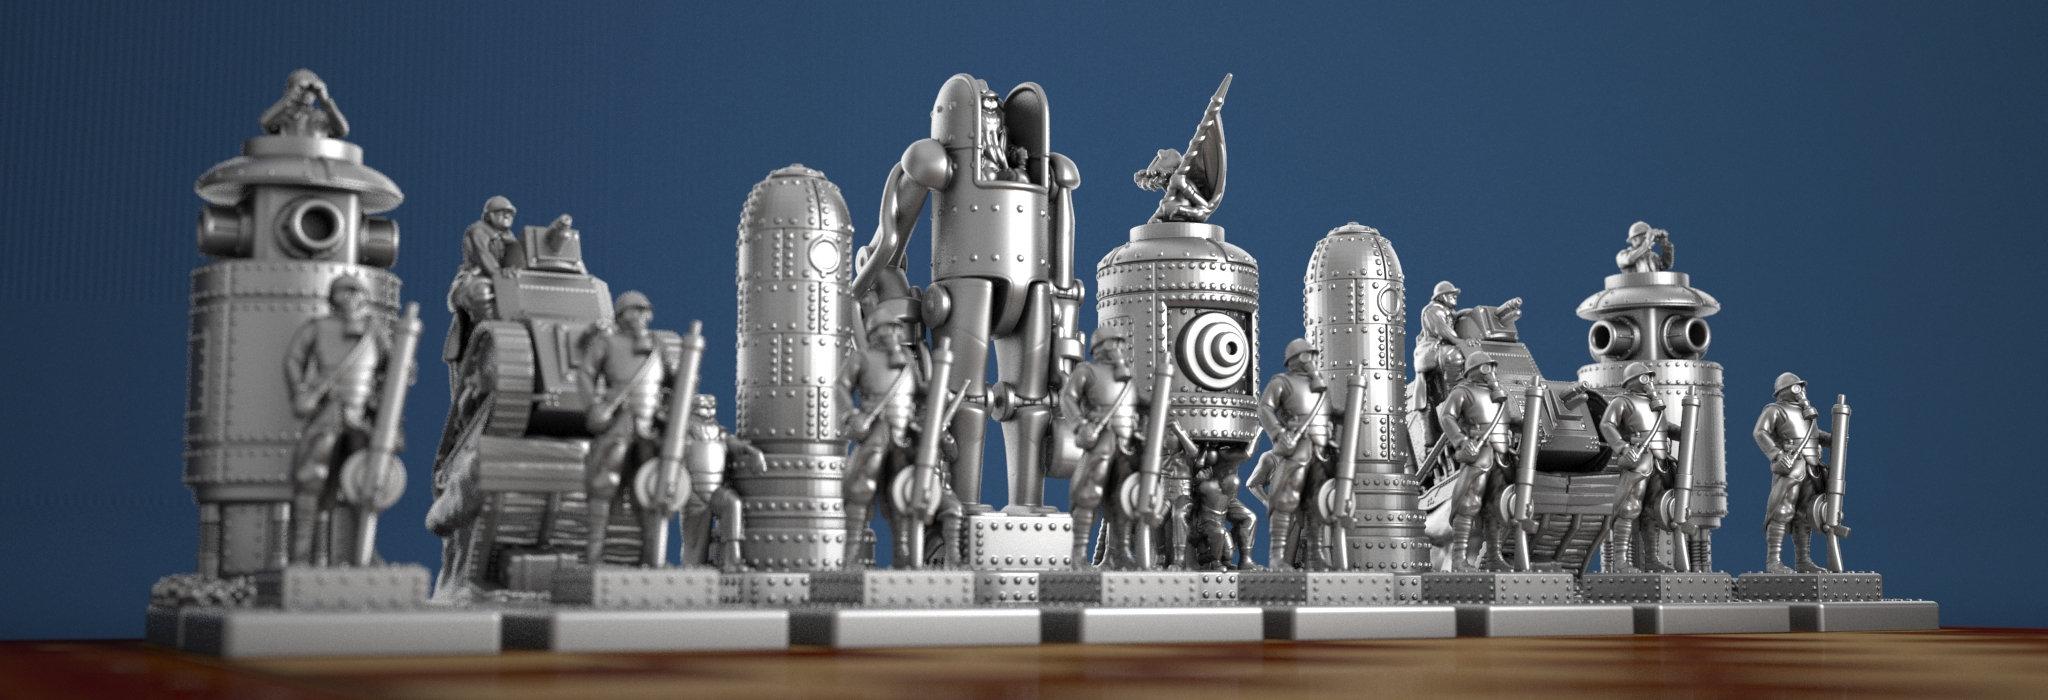 WW1_Steampunk_Chess_Game_07.jpg